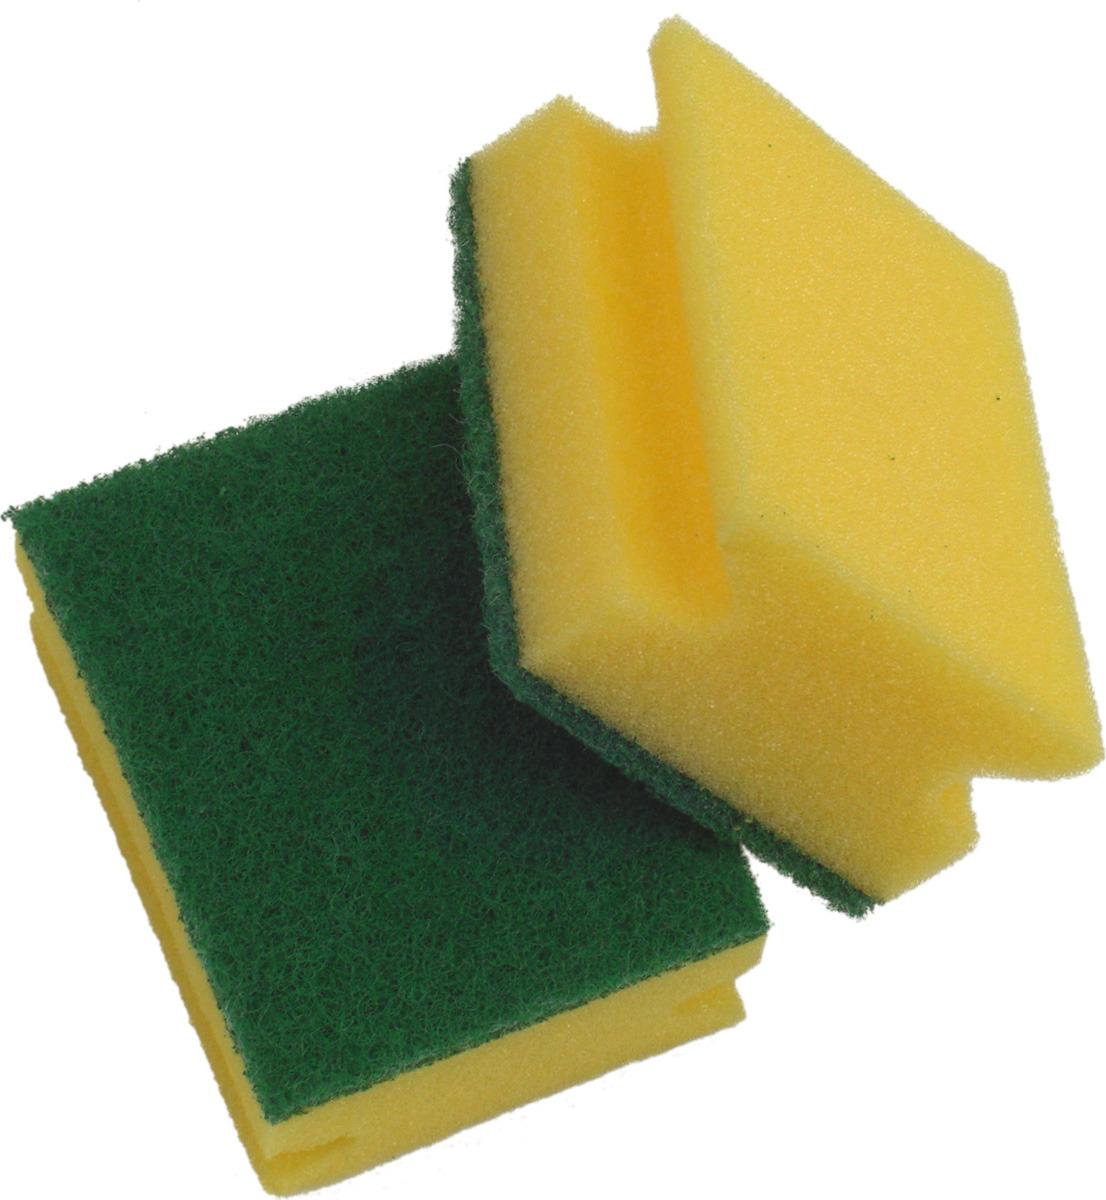 Губка Apex, 16018-A, 7 х 9 х 4,5 см, 2 шт 1 pieces miniature deep groove ball bearing 16018 16018rs 16018 2rs 16018 2rs size 90x140x16mm